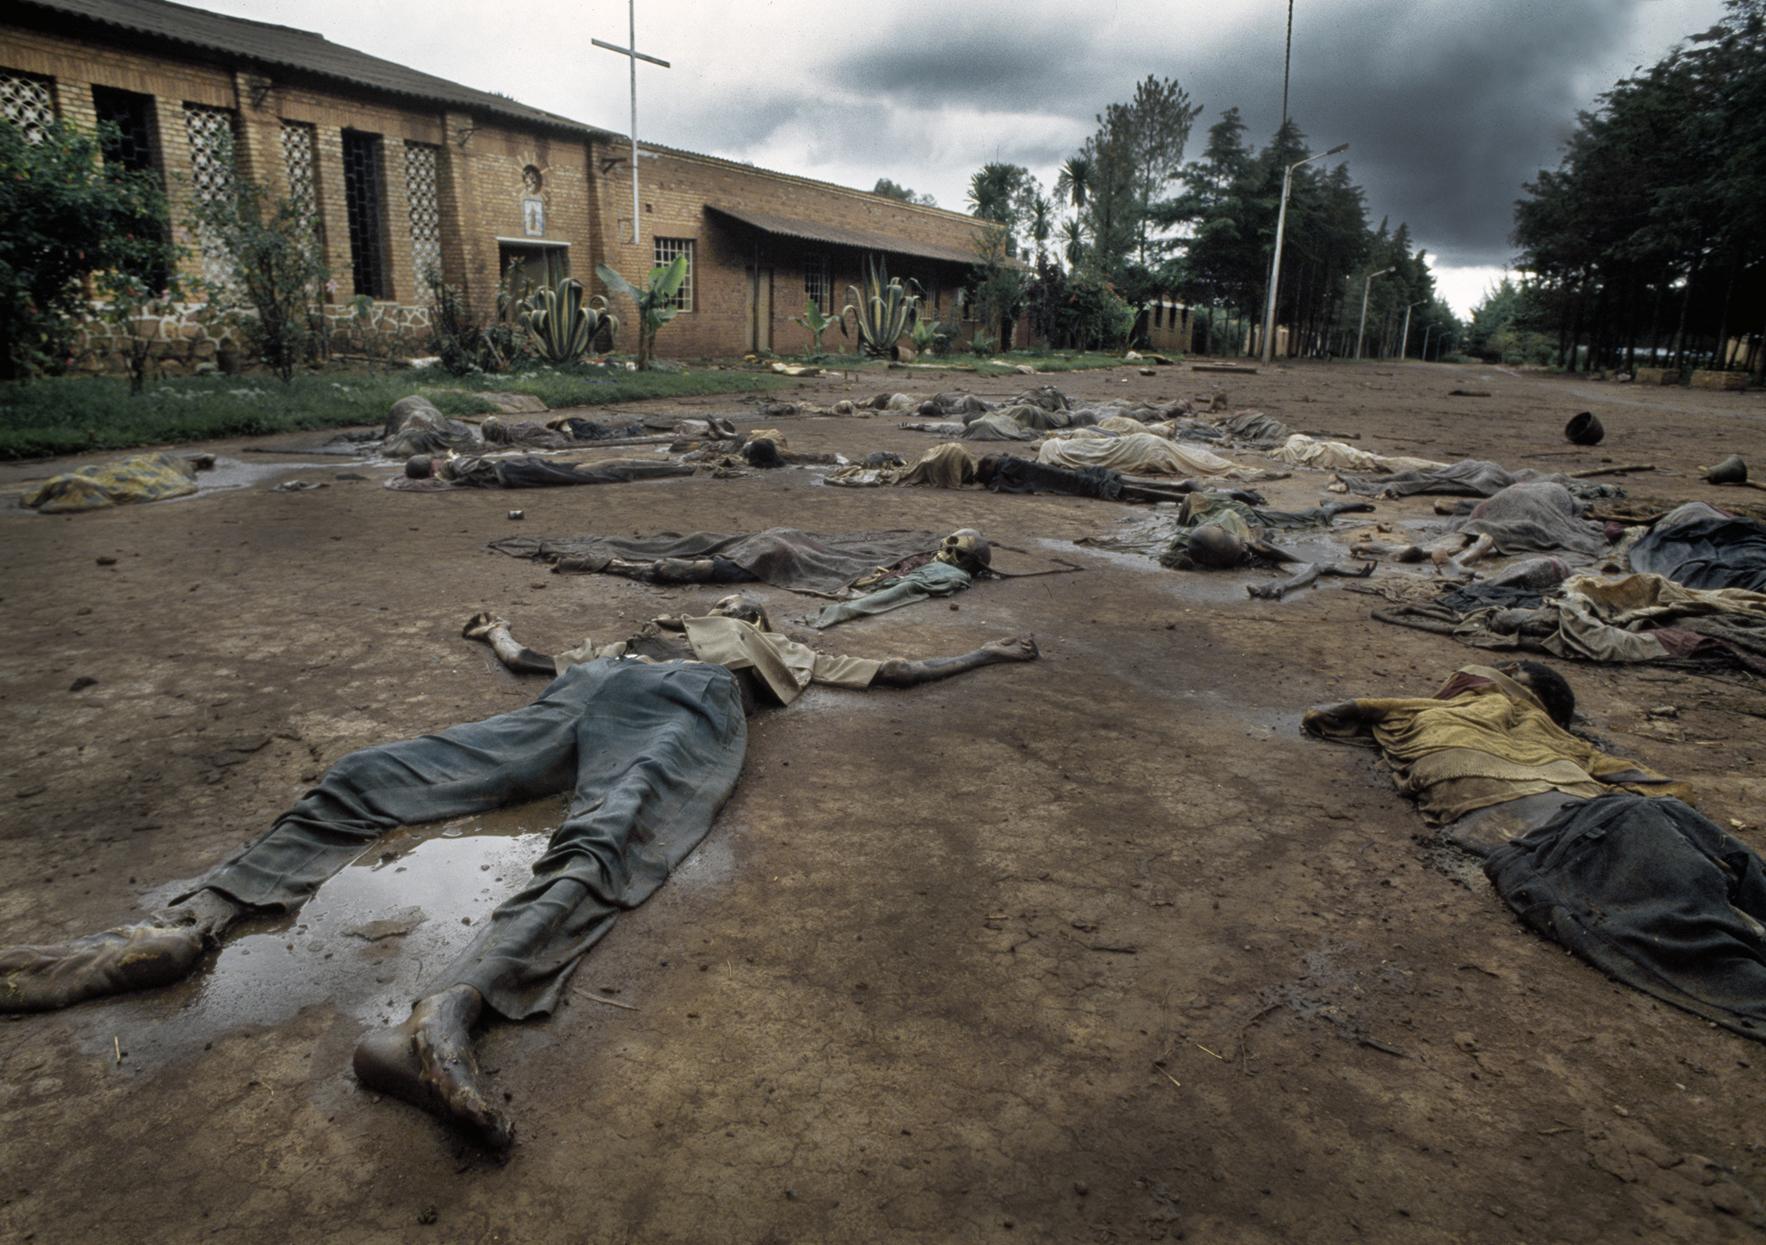 Corpses of Tutu massacre victims outside a Belgian Catholic Church in Rukara. Genocide, Rwanda, 1994